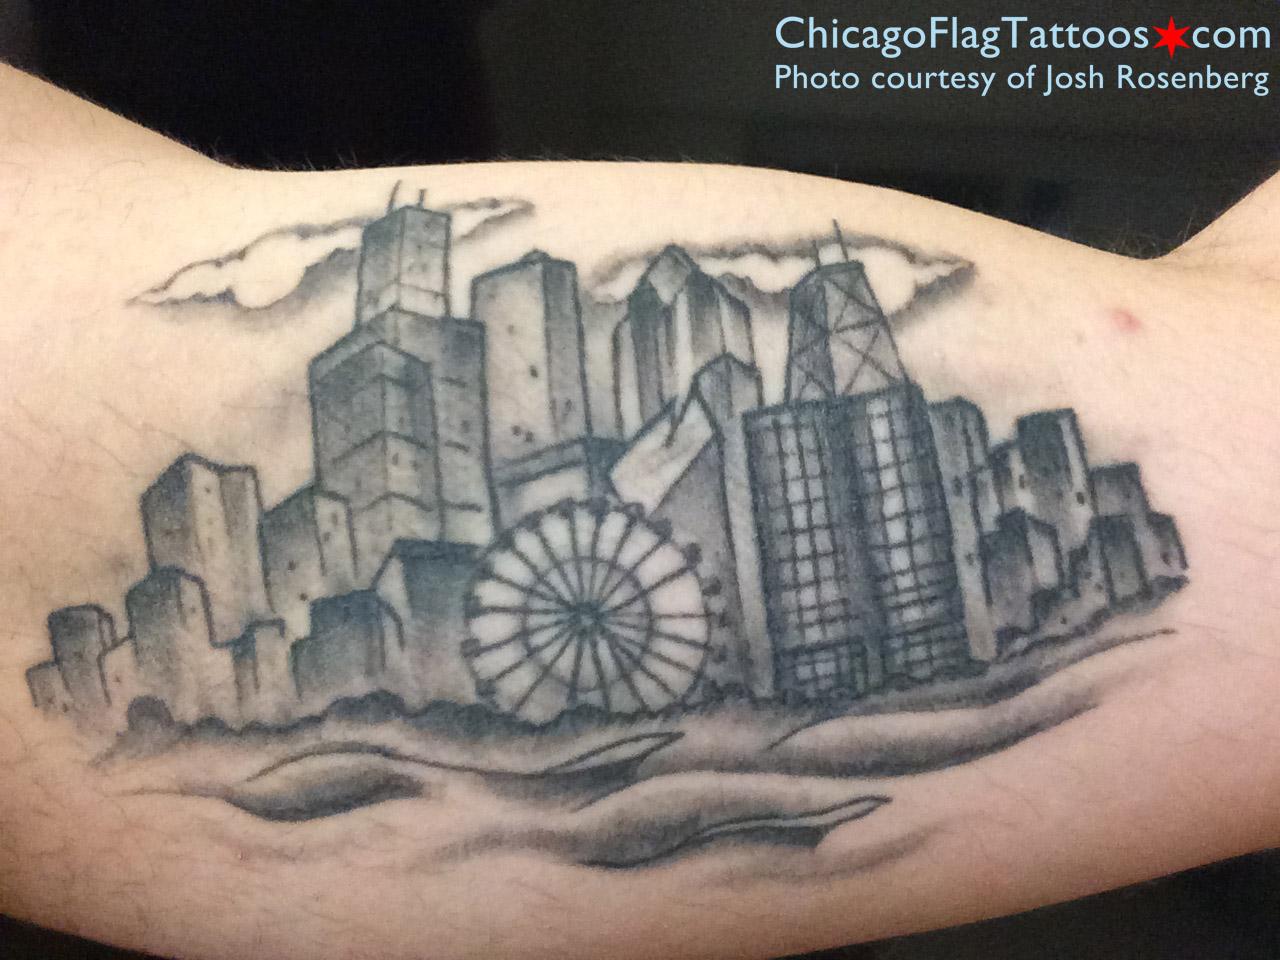 http://chicagoflagtattoos.com/img/Josh-Rosenberg-tattoo.jpg